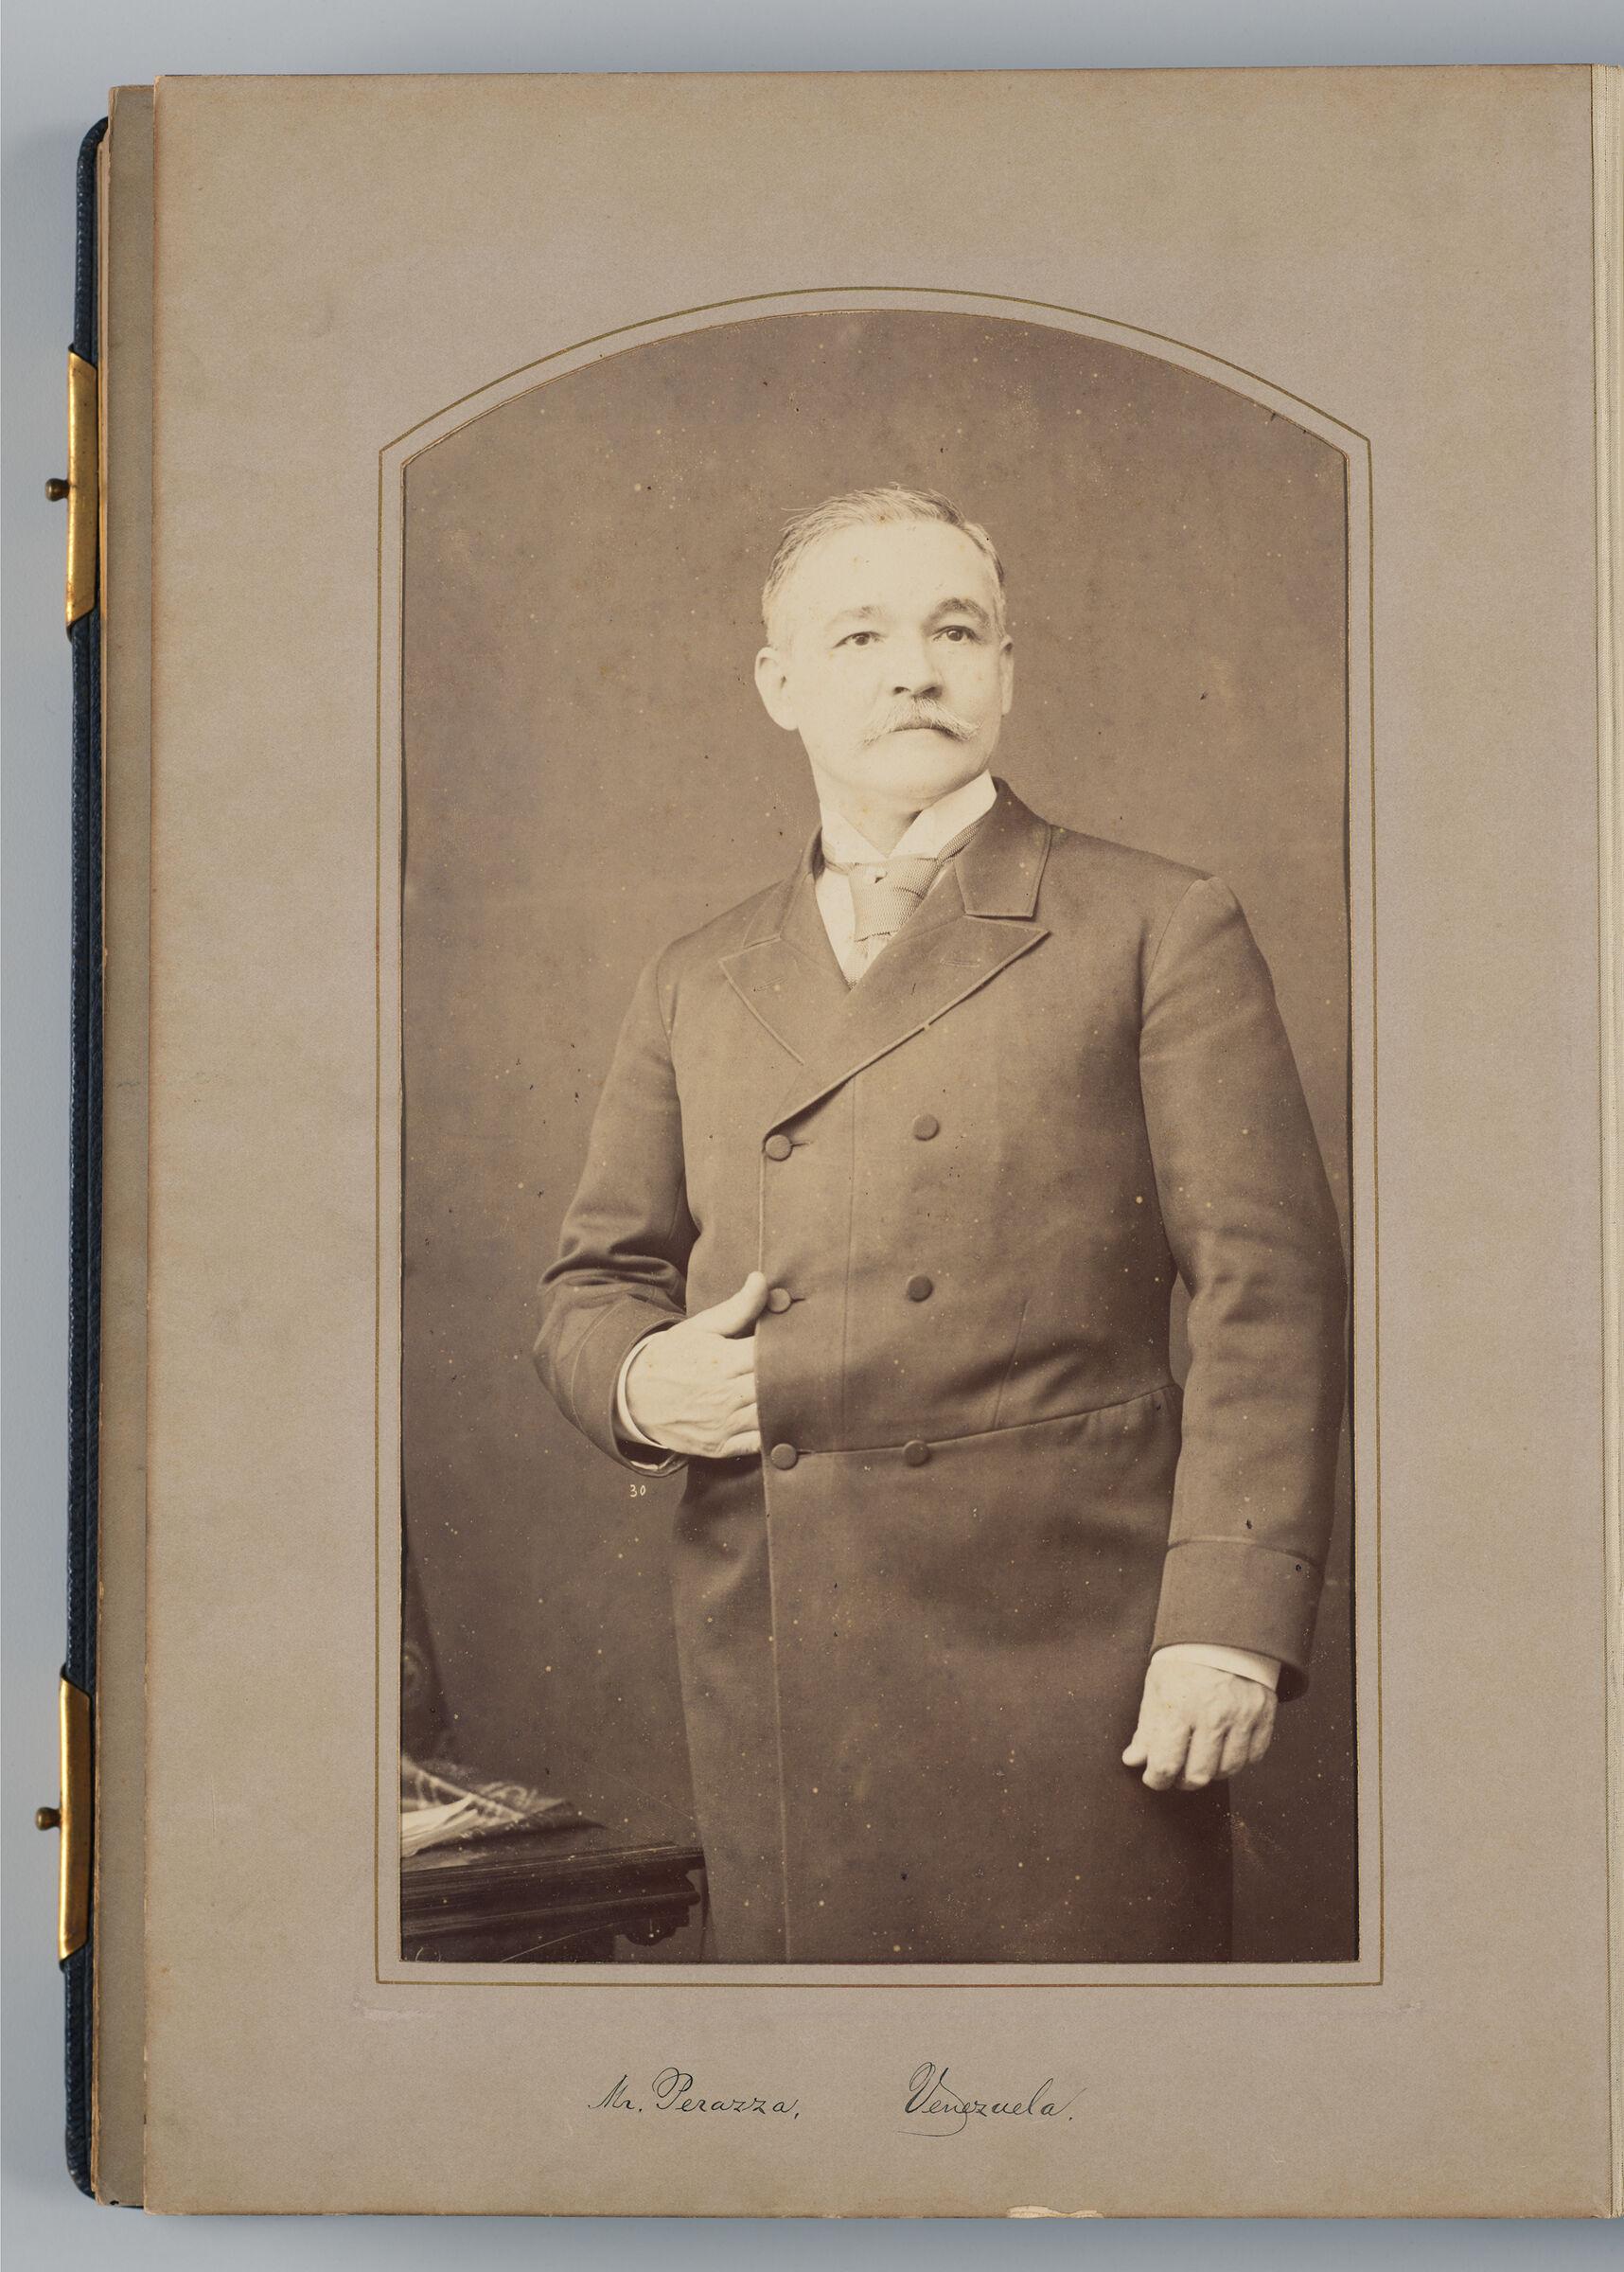 N. Bolet Peraza (Veneuzelan Delegate)